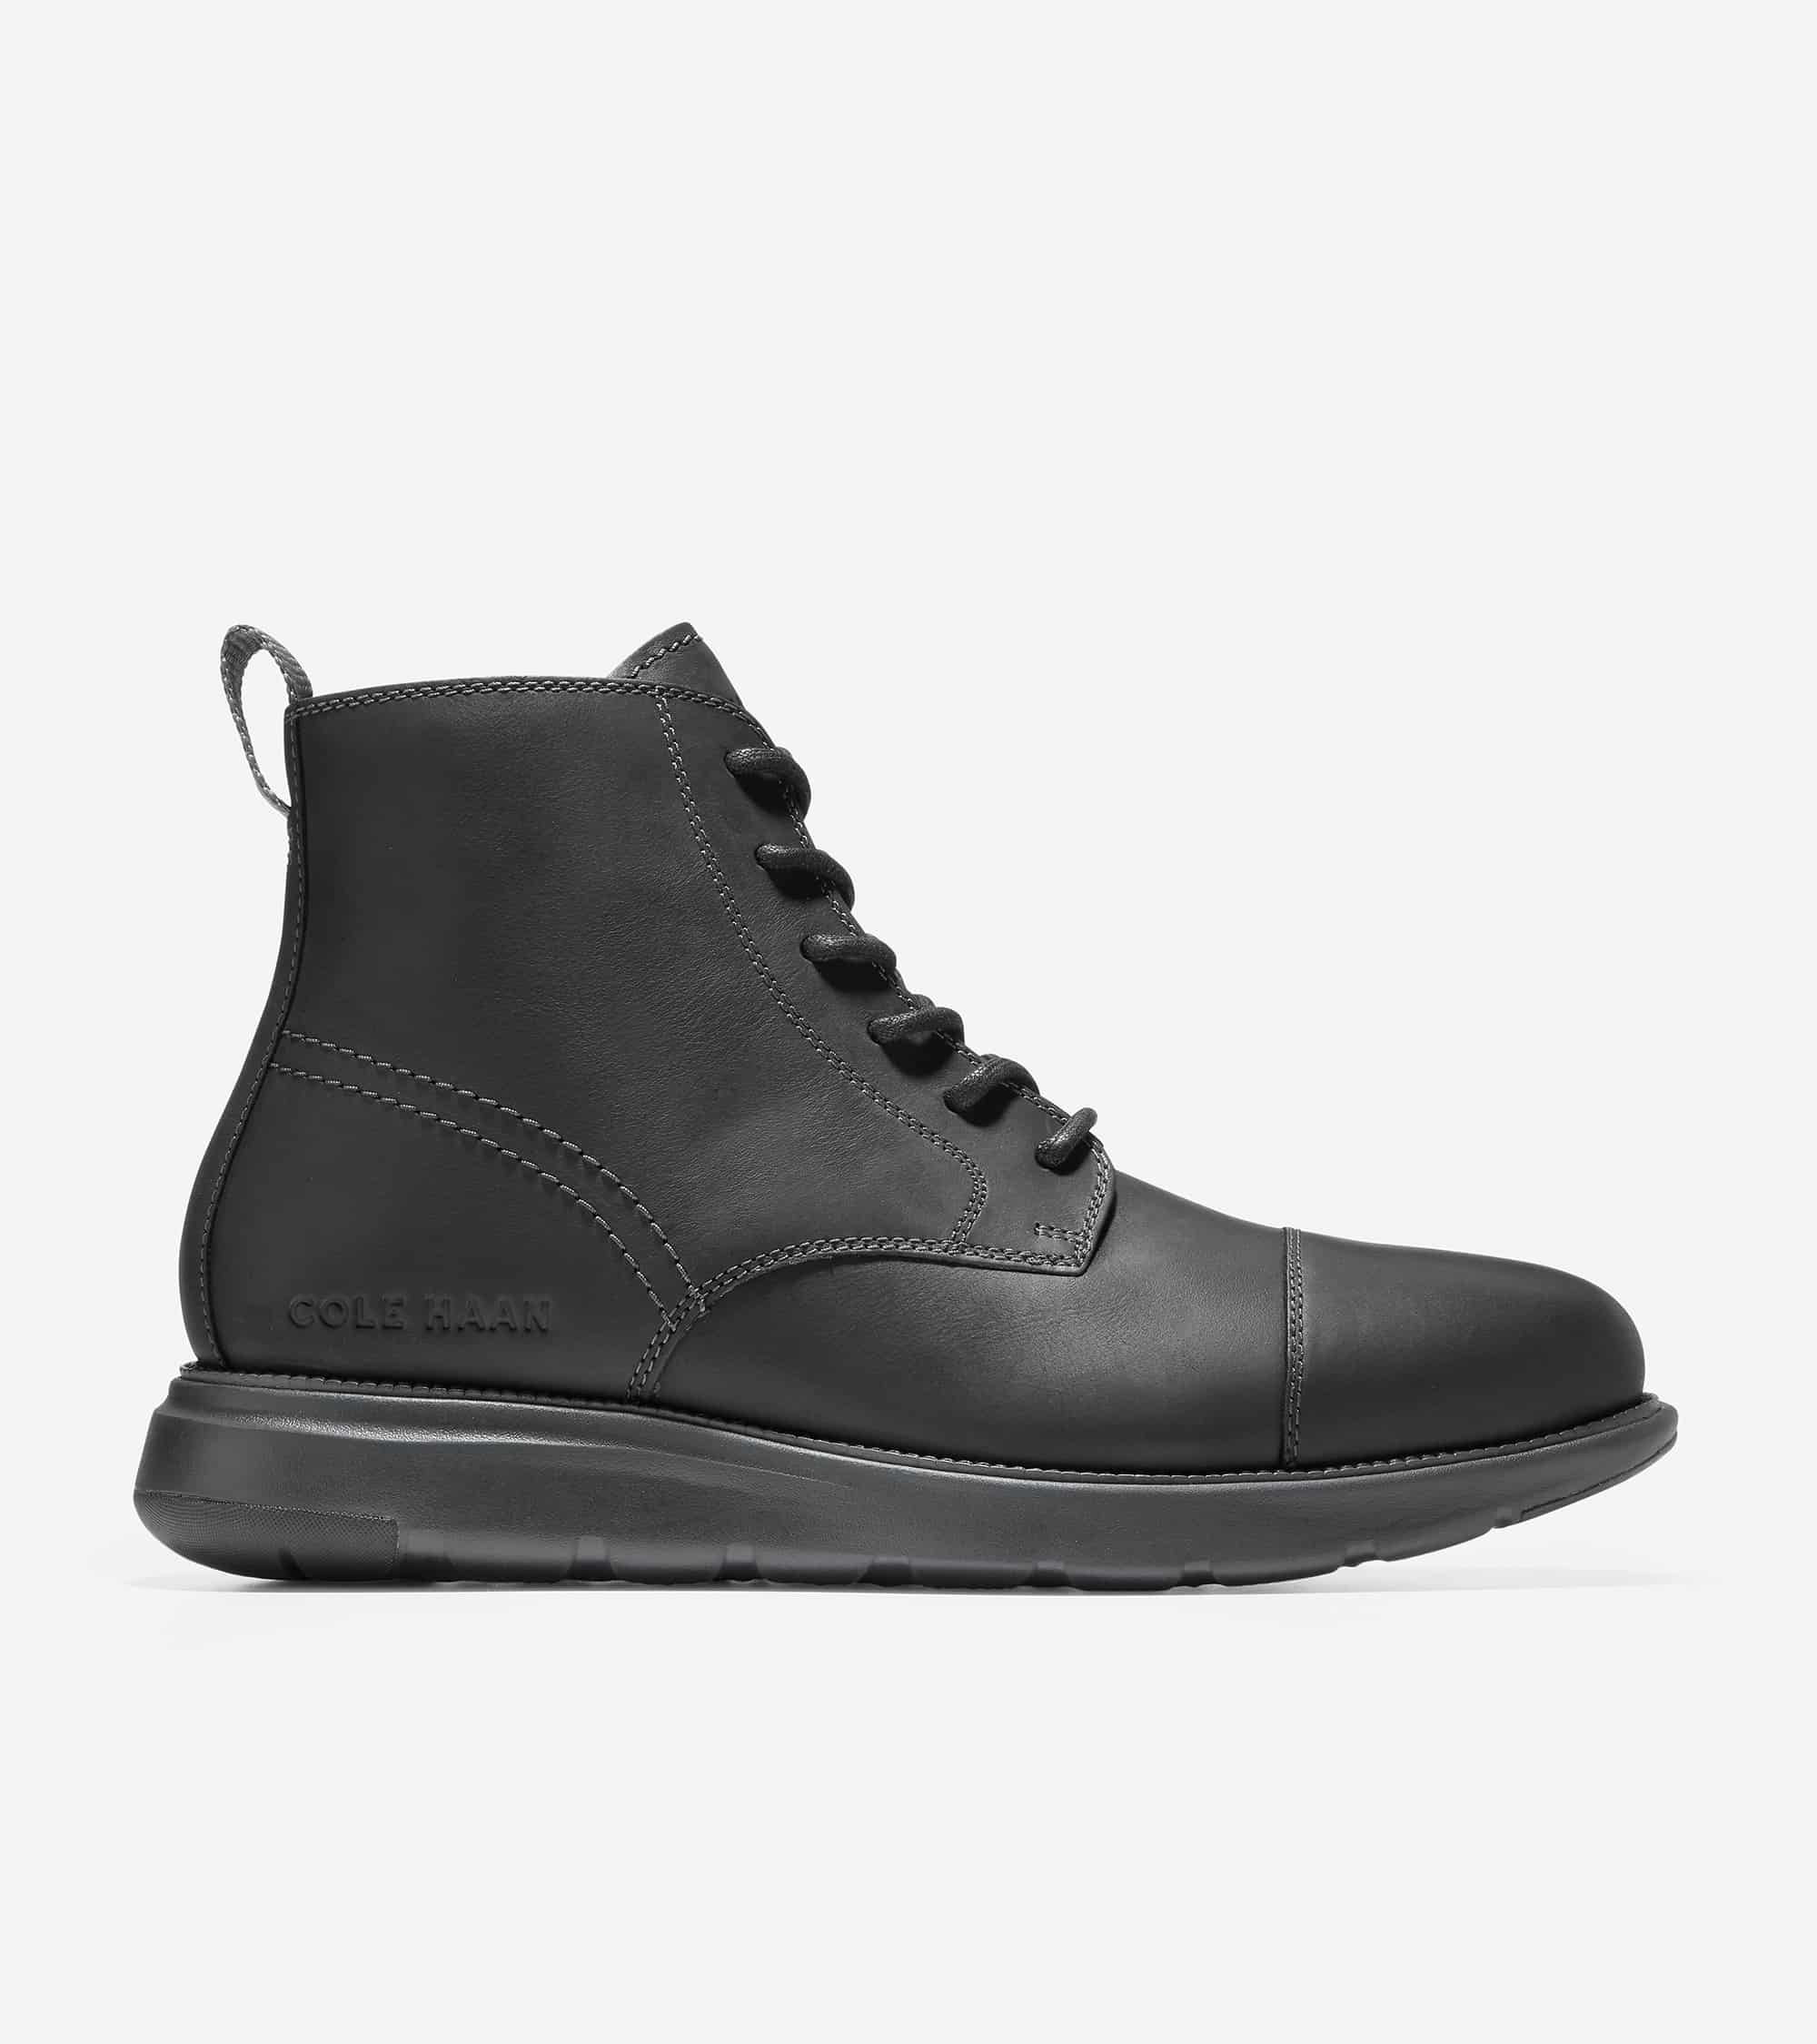 Cole Haan Grand Atlantic Boot Black/Black